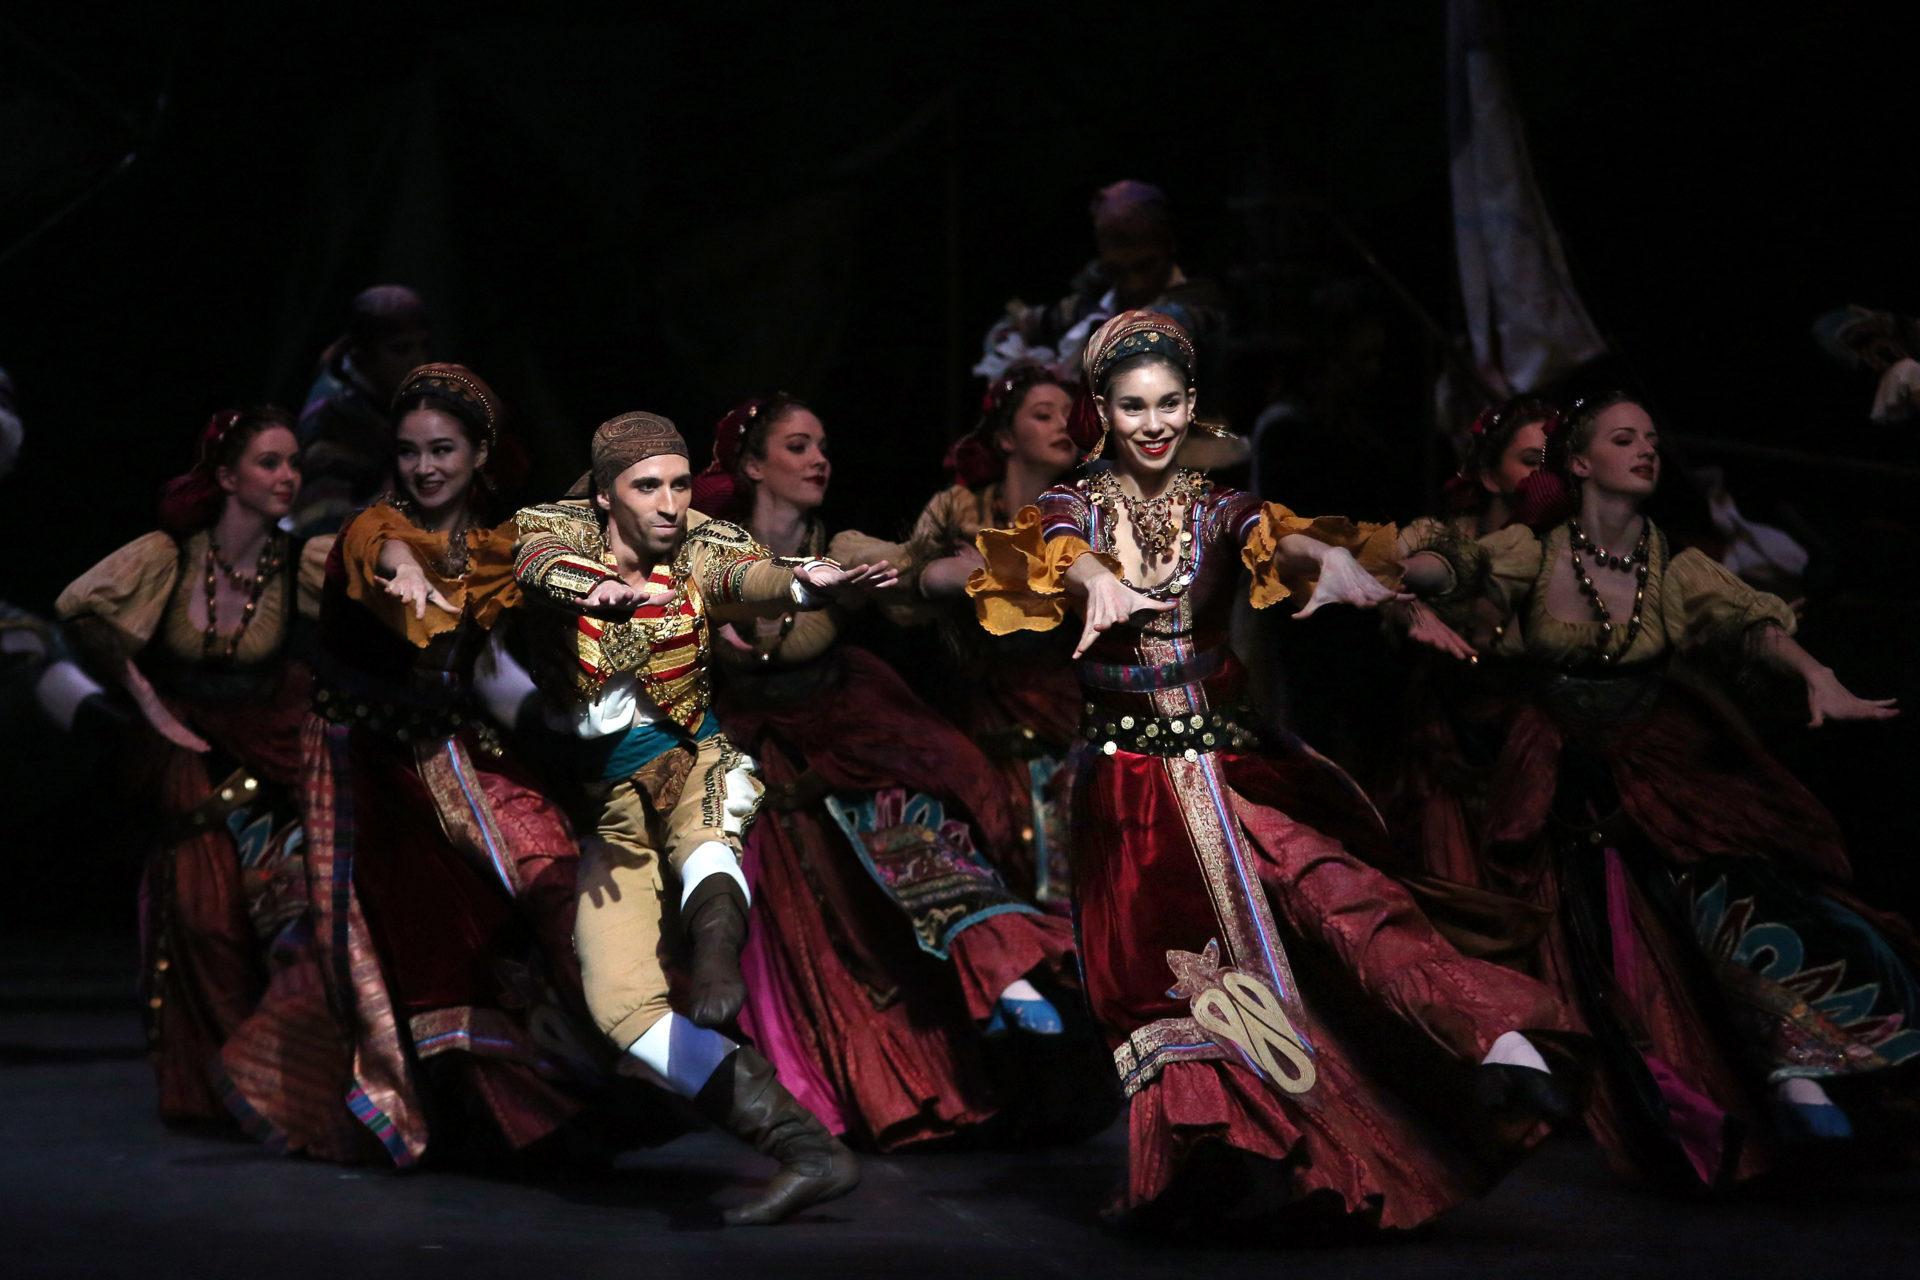 Don_Quixote_HH_Ballett_Foto_AnjaBeutler.de_366